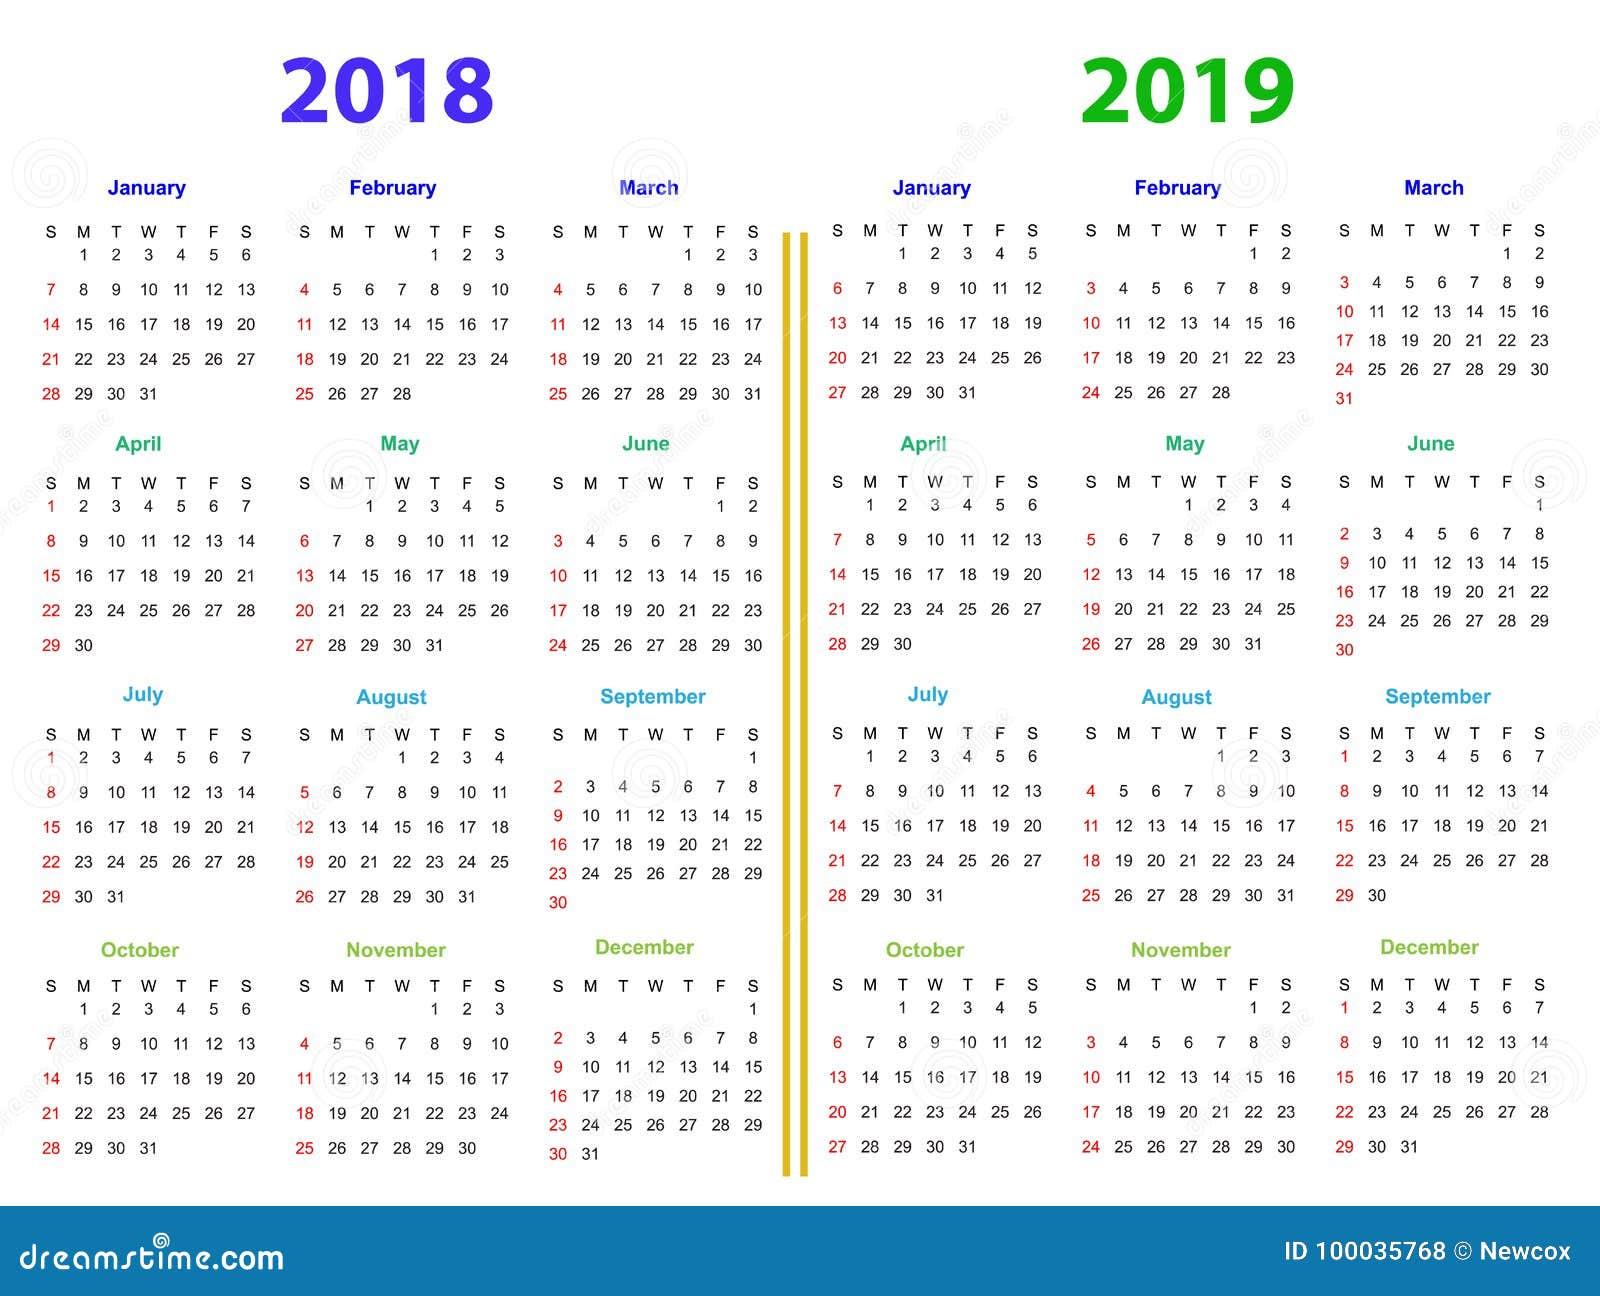 12 months calendar design 2018 2019 stock vector illustration of